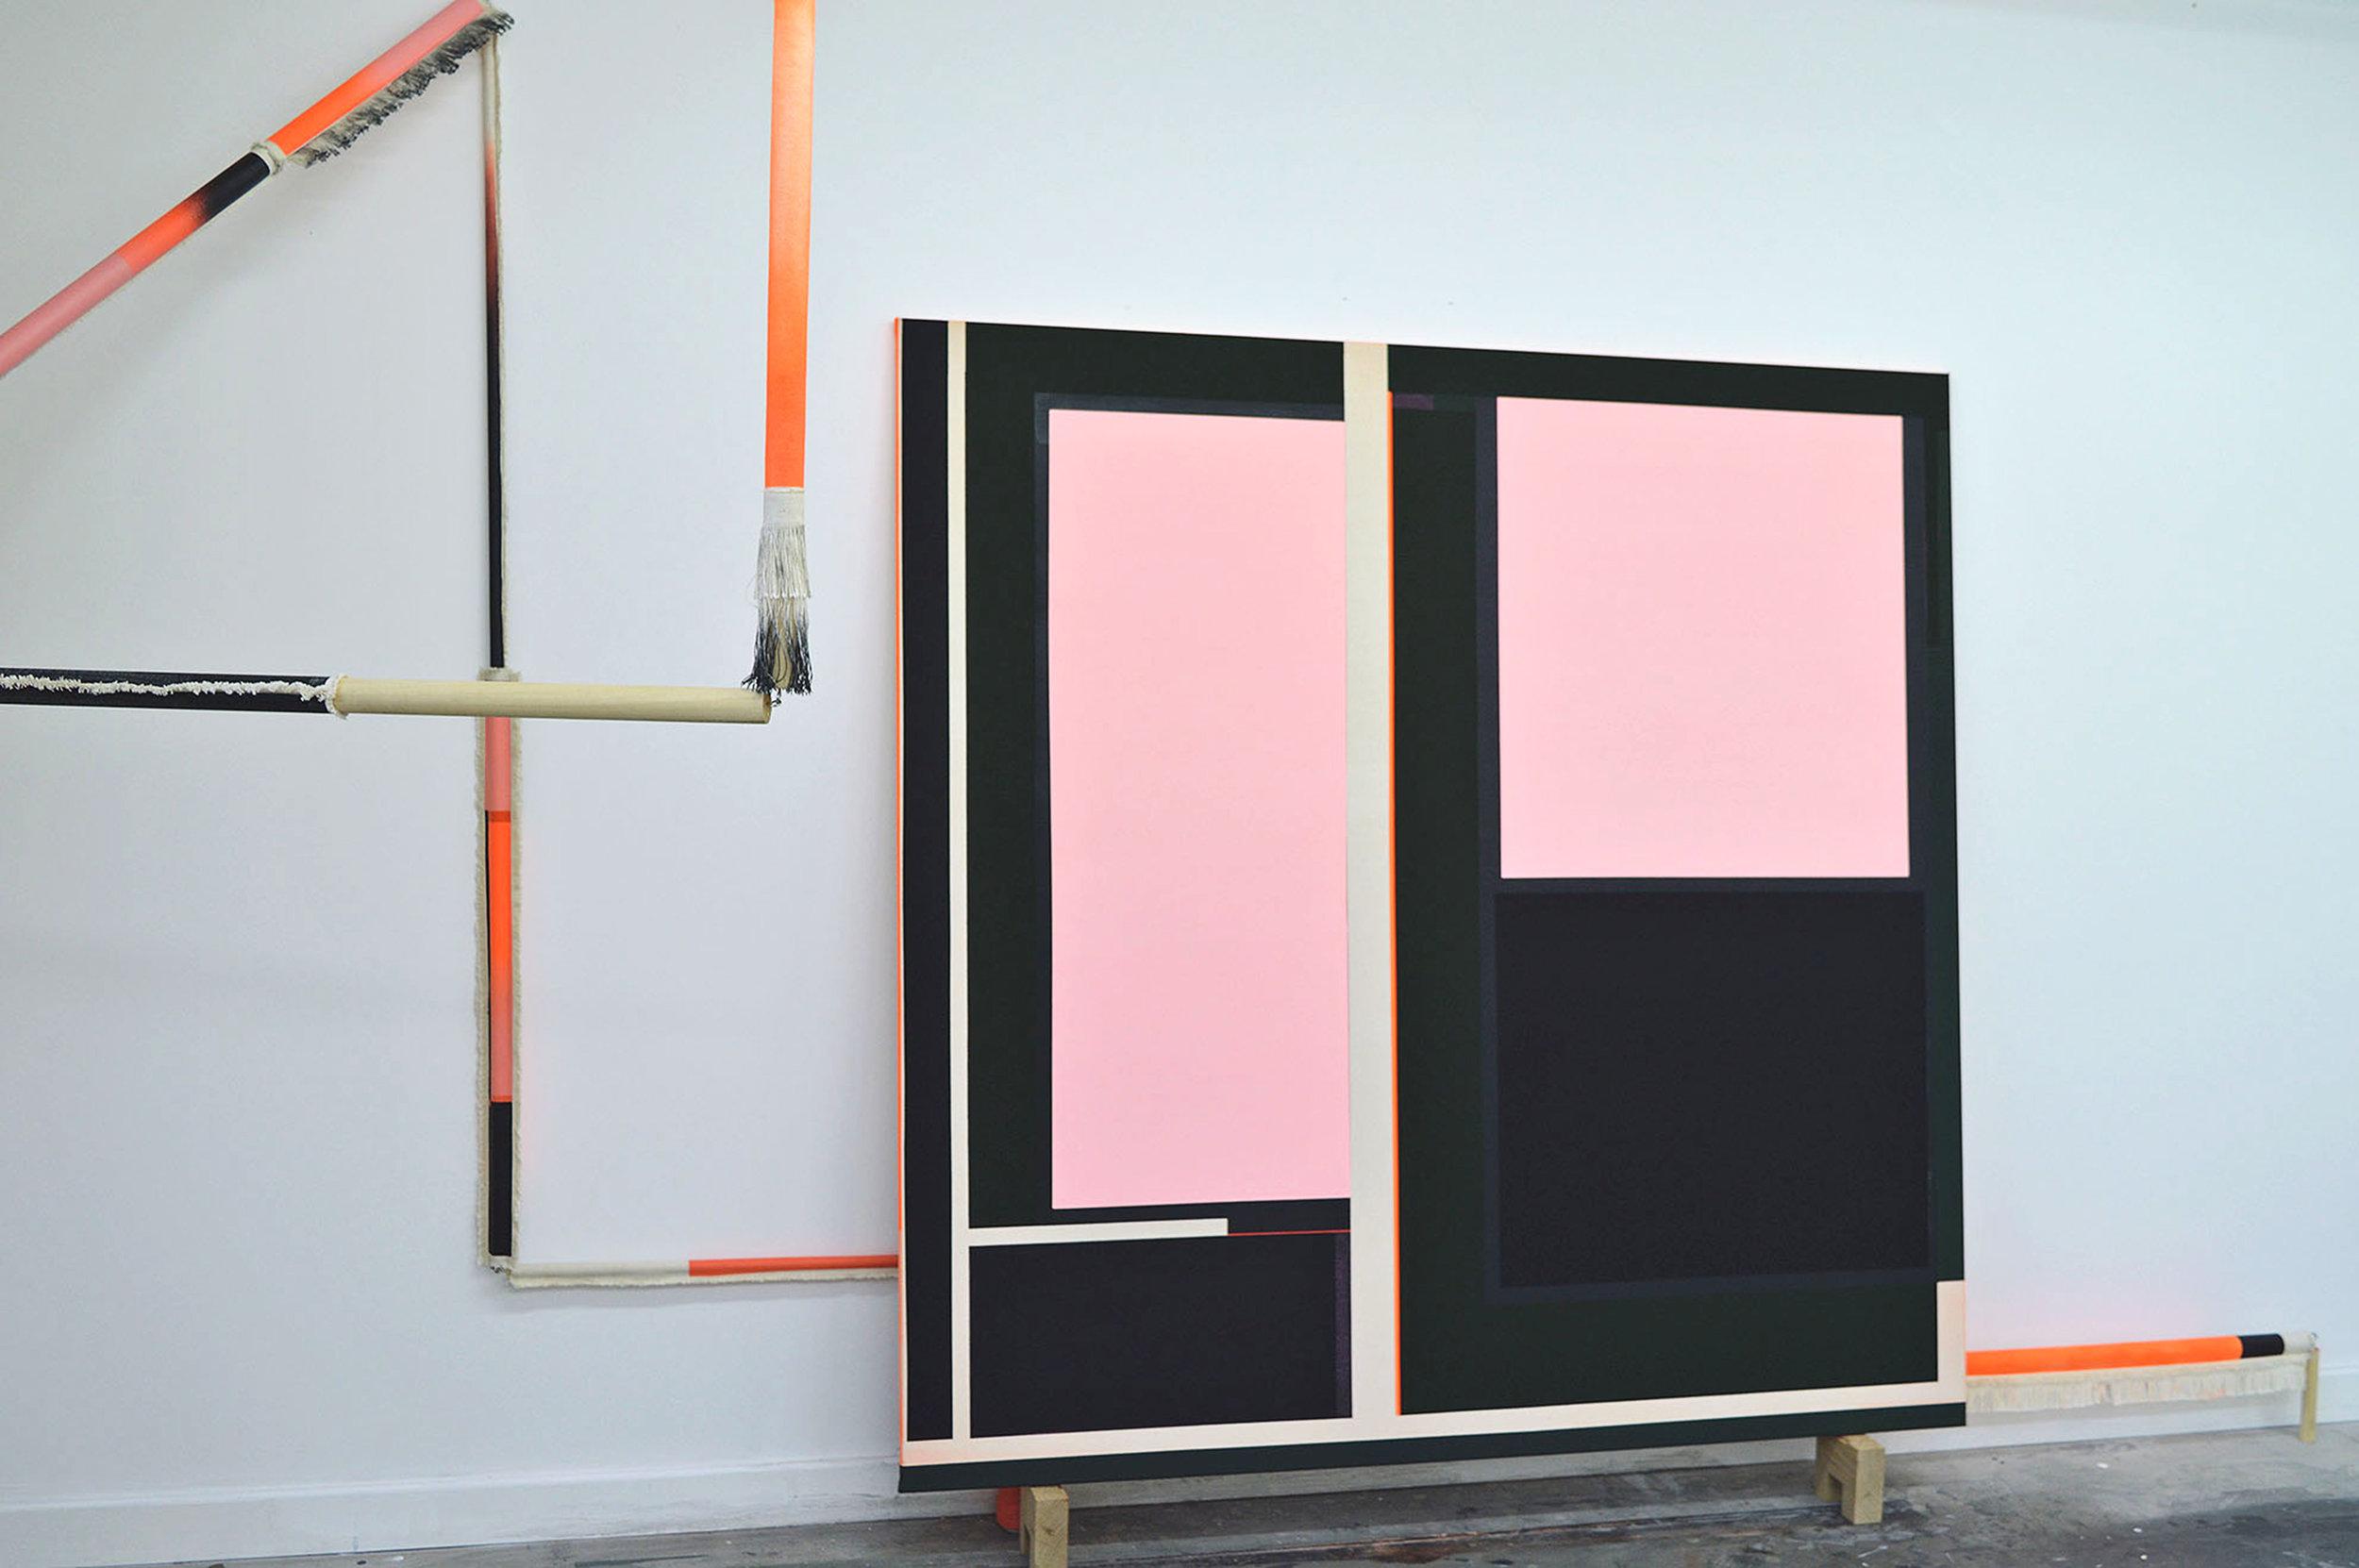 Andrea Medjesi-Jones, Pinkpaintingmachine 2, 2017.jpg